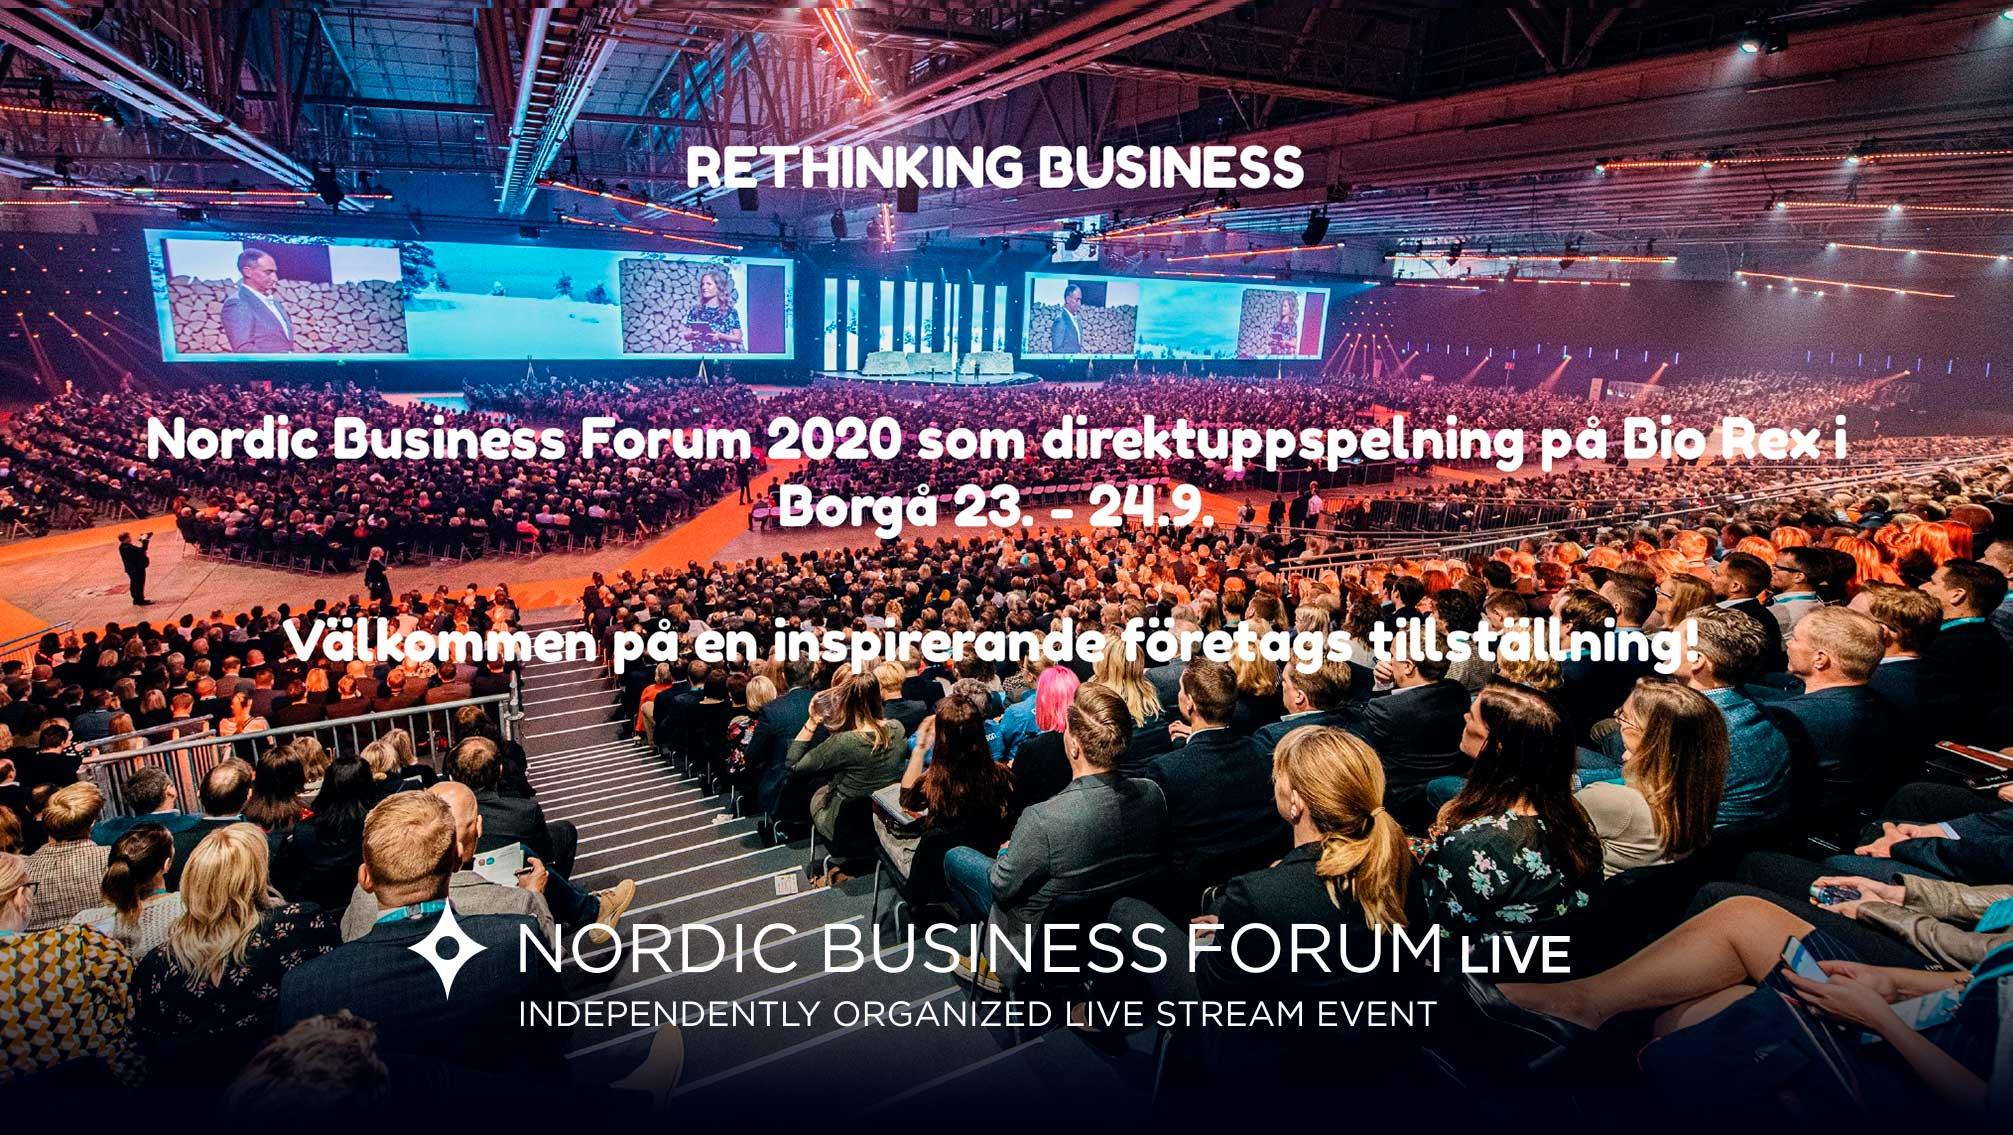 AVBRUTET: Nordic Business Forum 2020 som live stream i Borgå Bio Rex 23.-24.09.